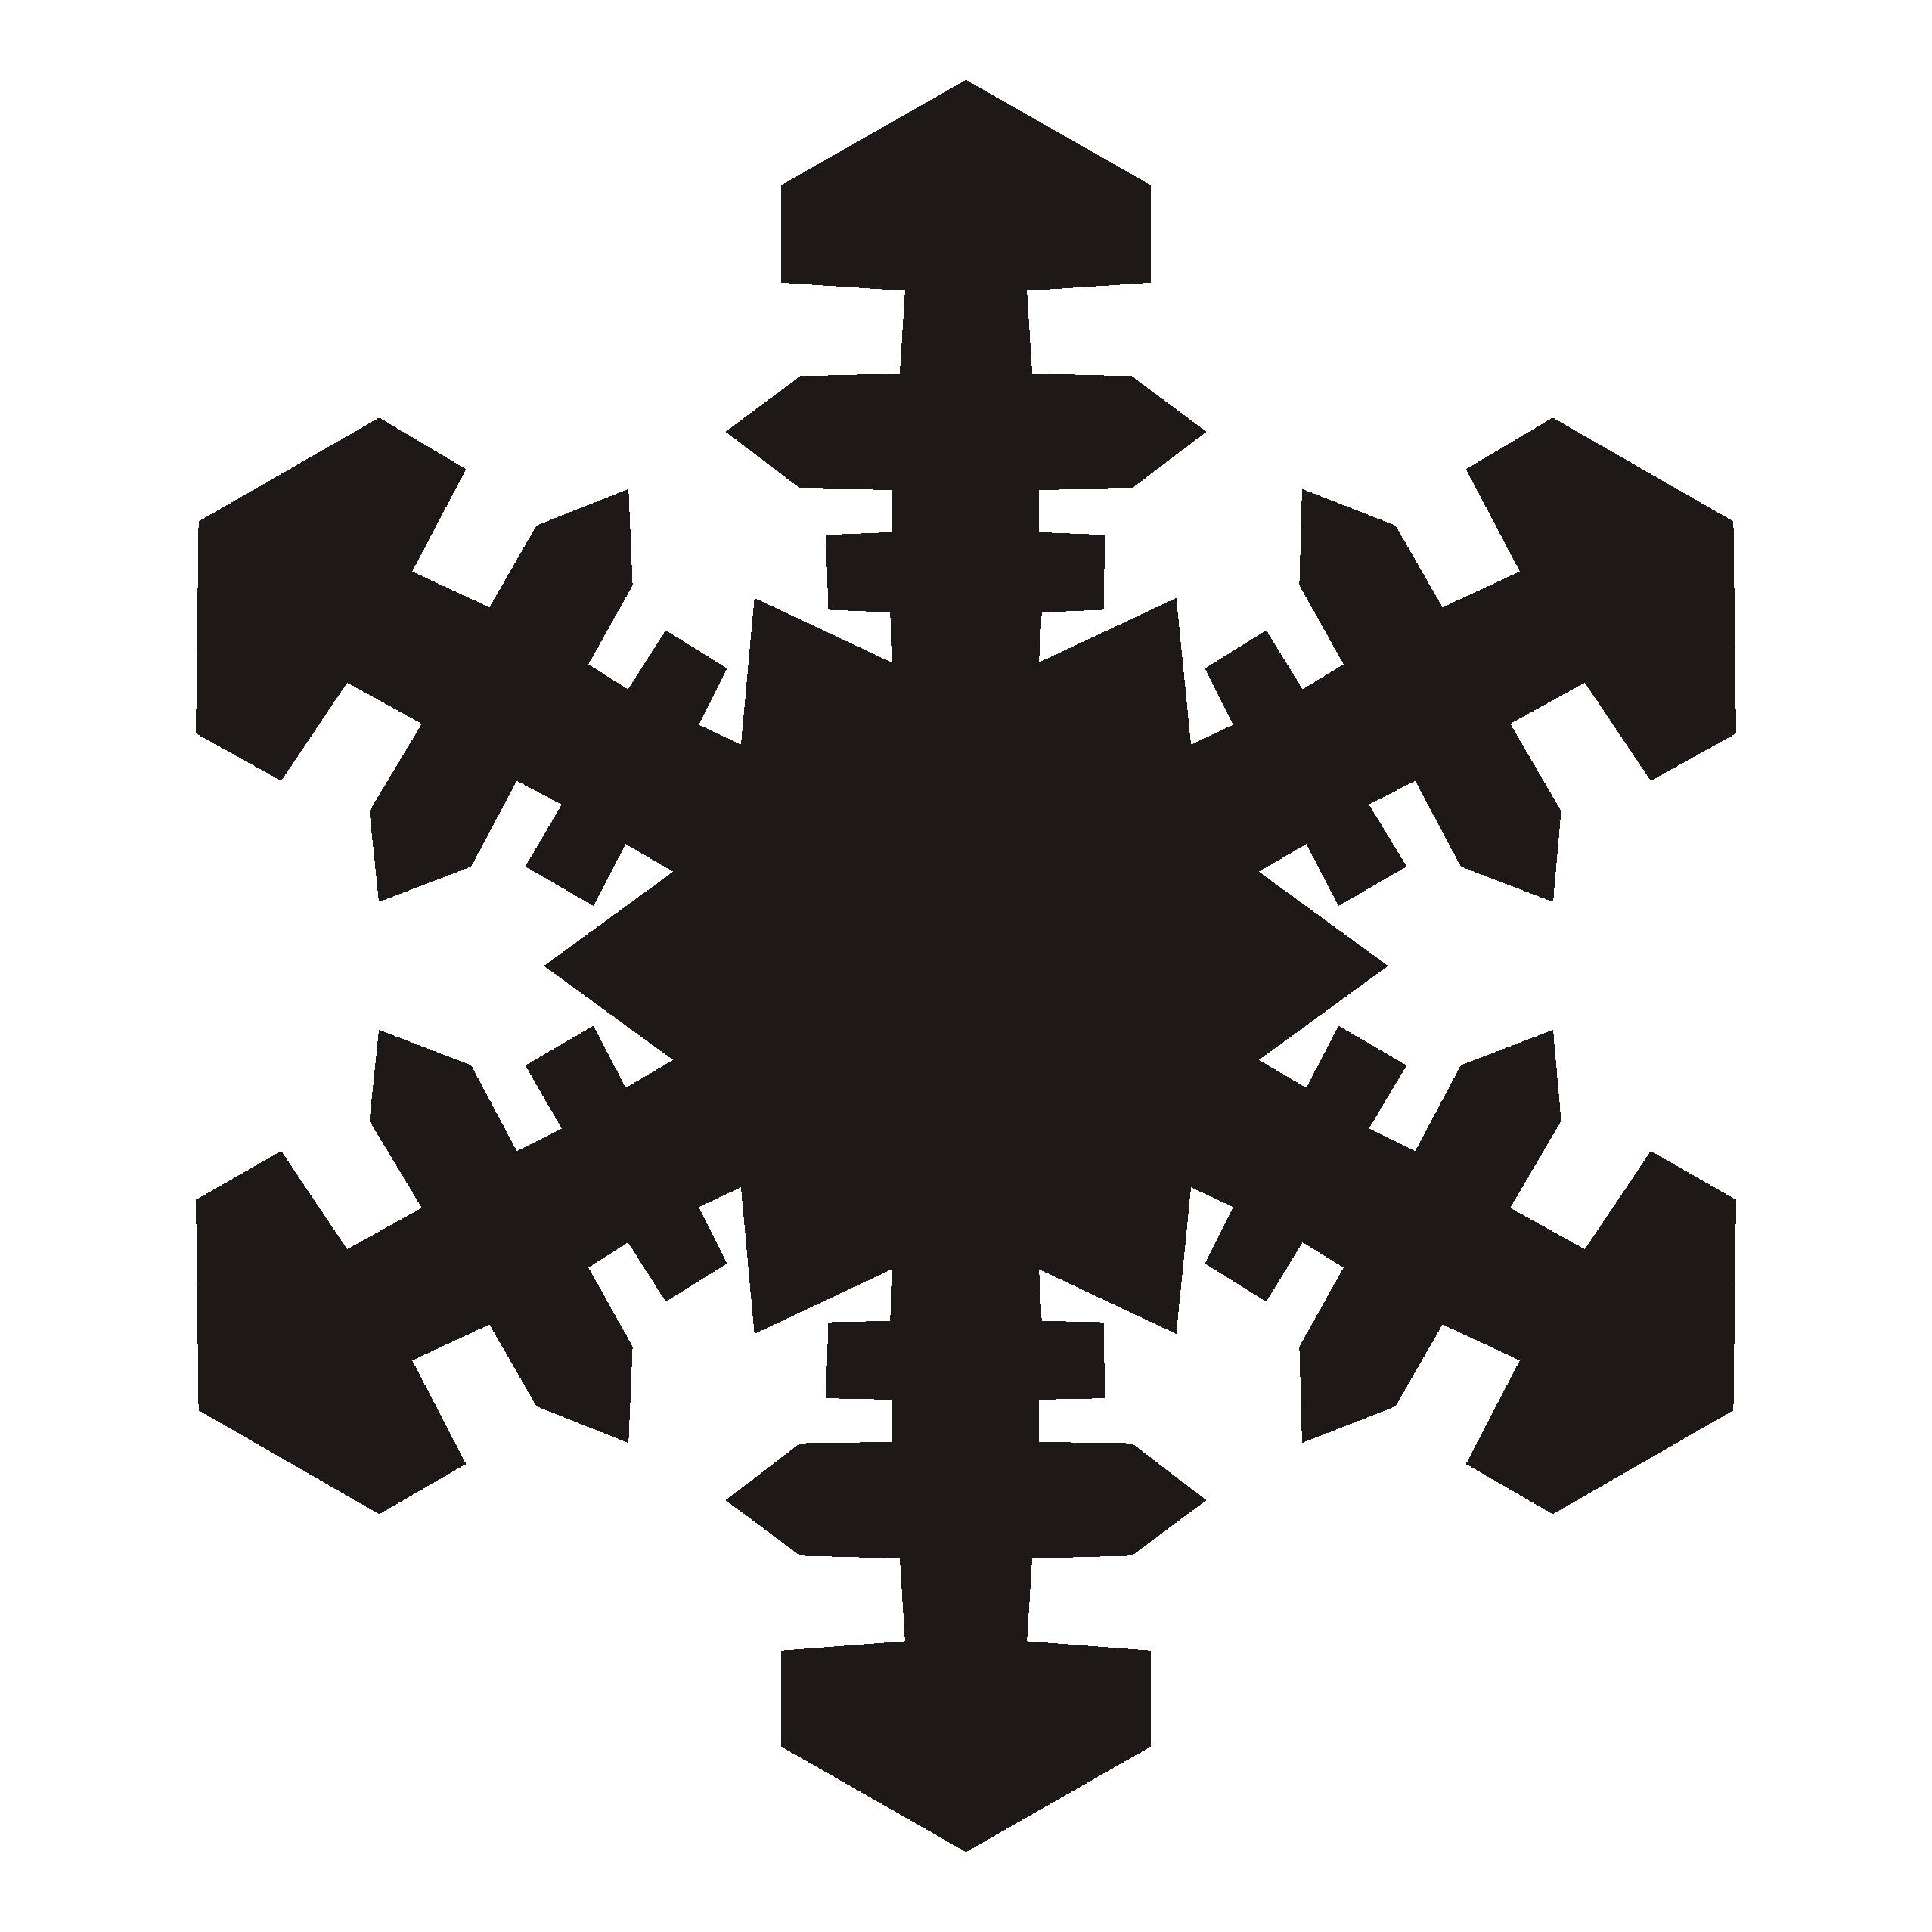 2555x2555 Clip Art Snowflake Clipart Panda